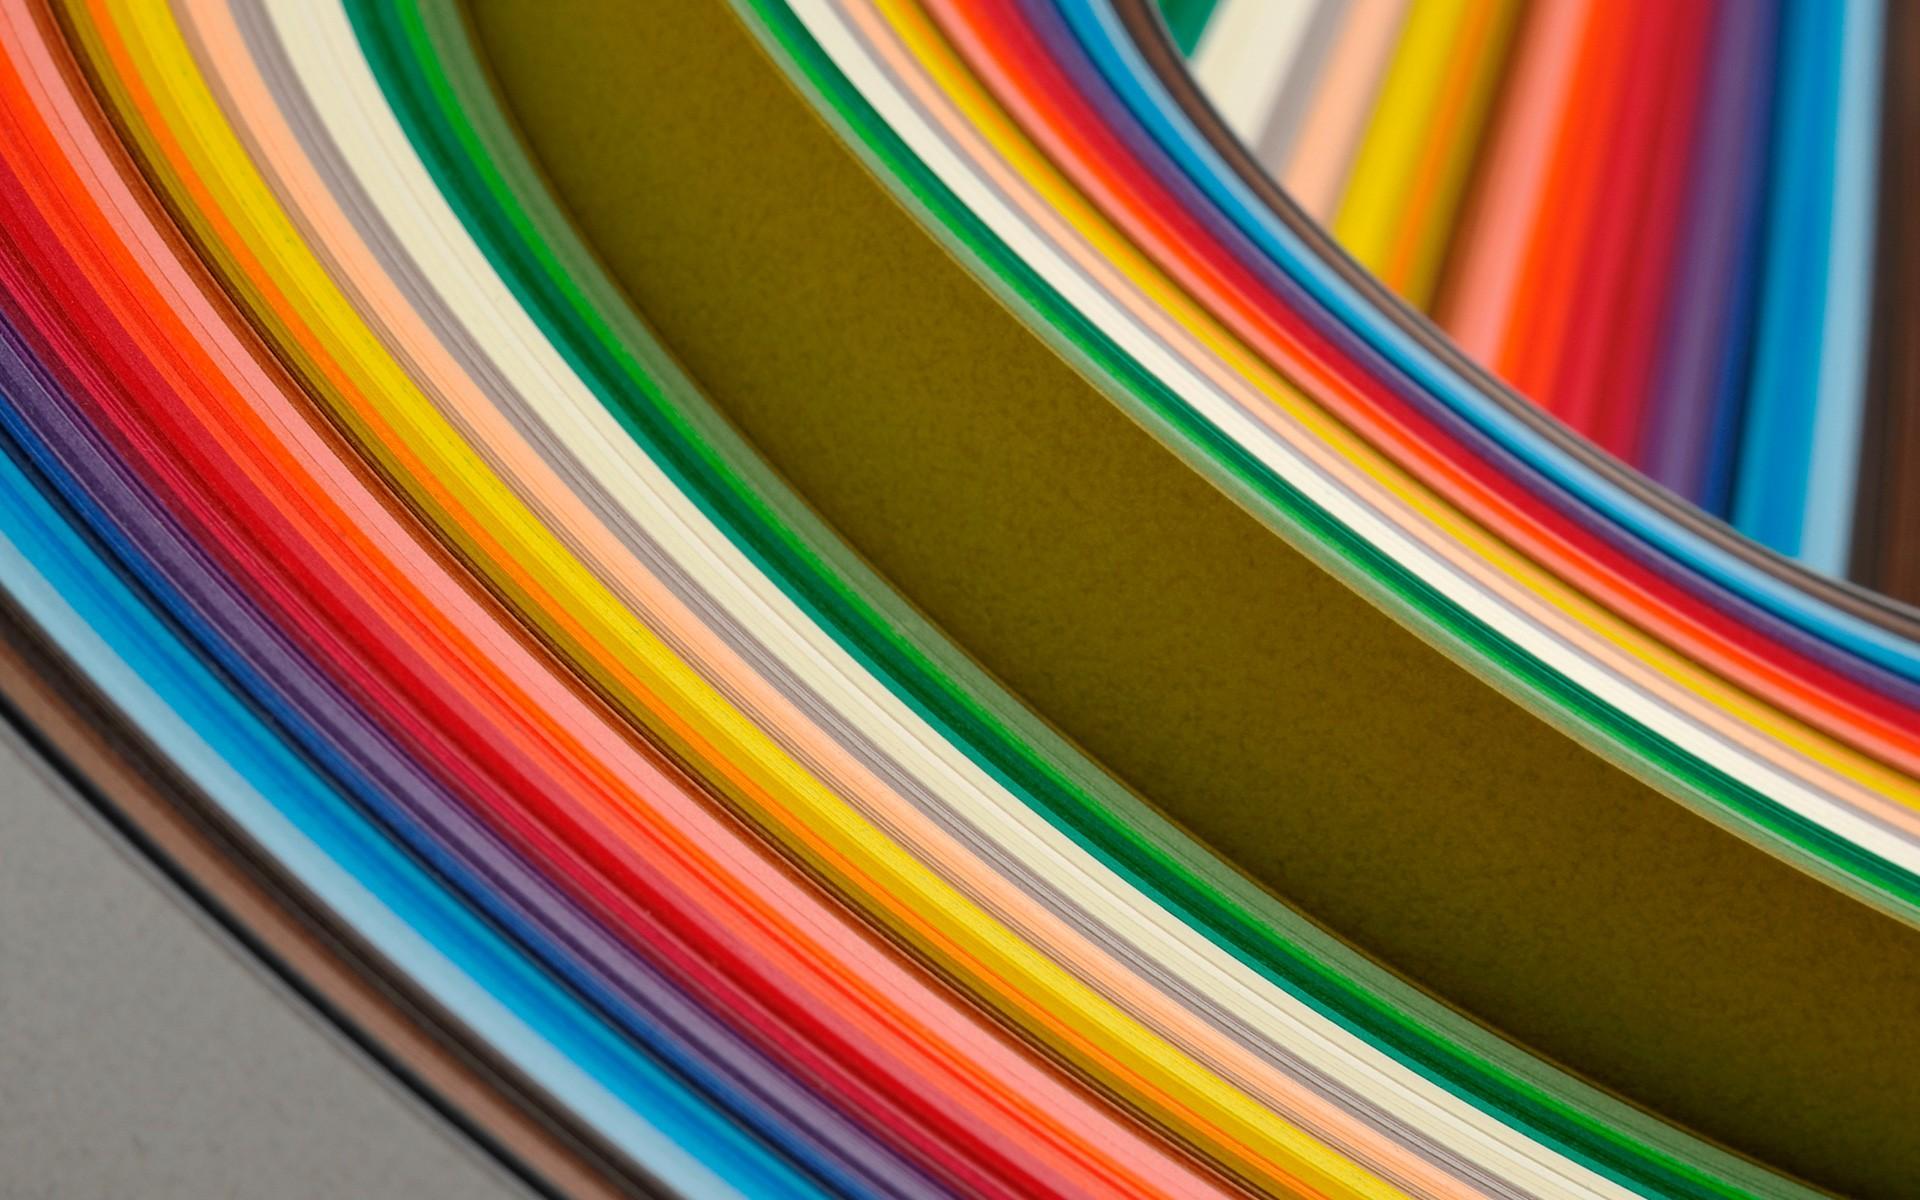 Curvas coloridas Windows 8 - 1920x1200